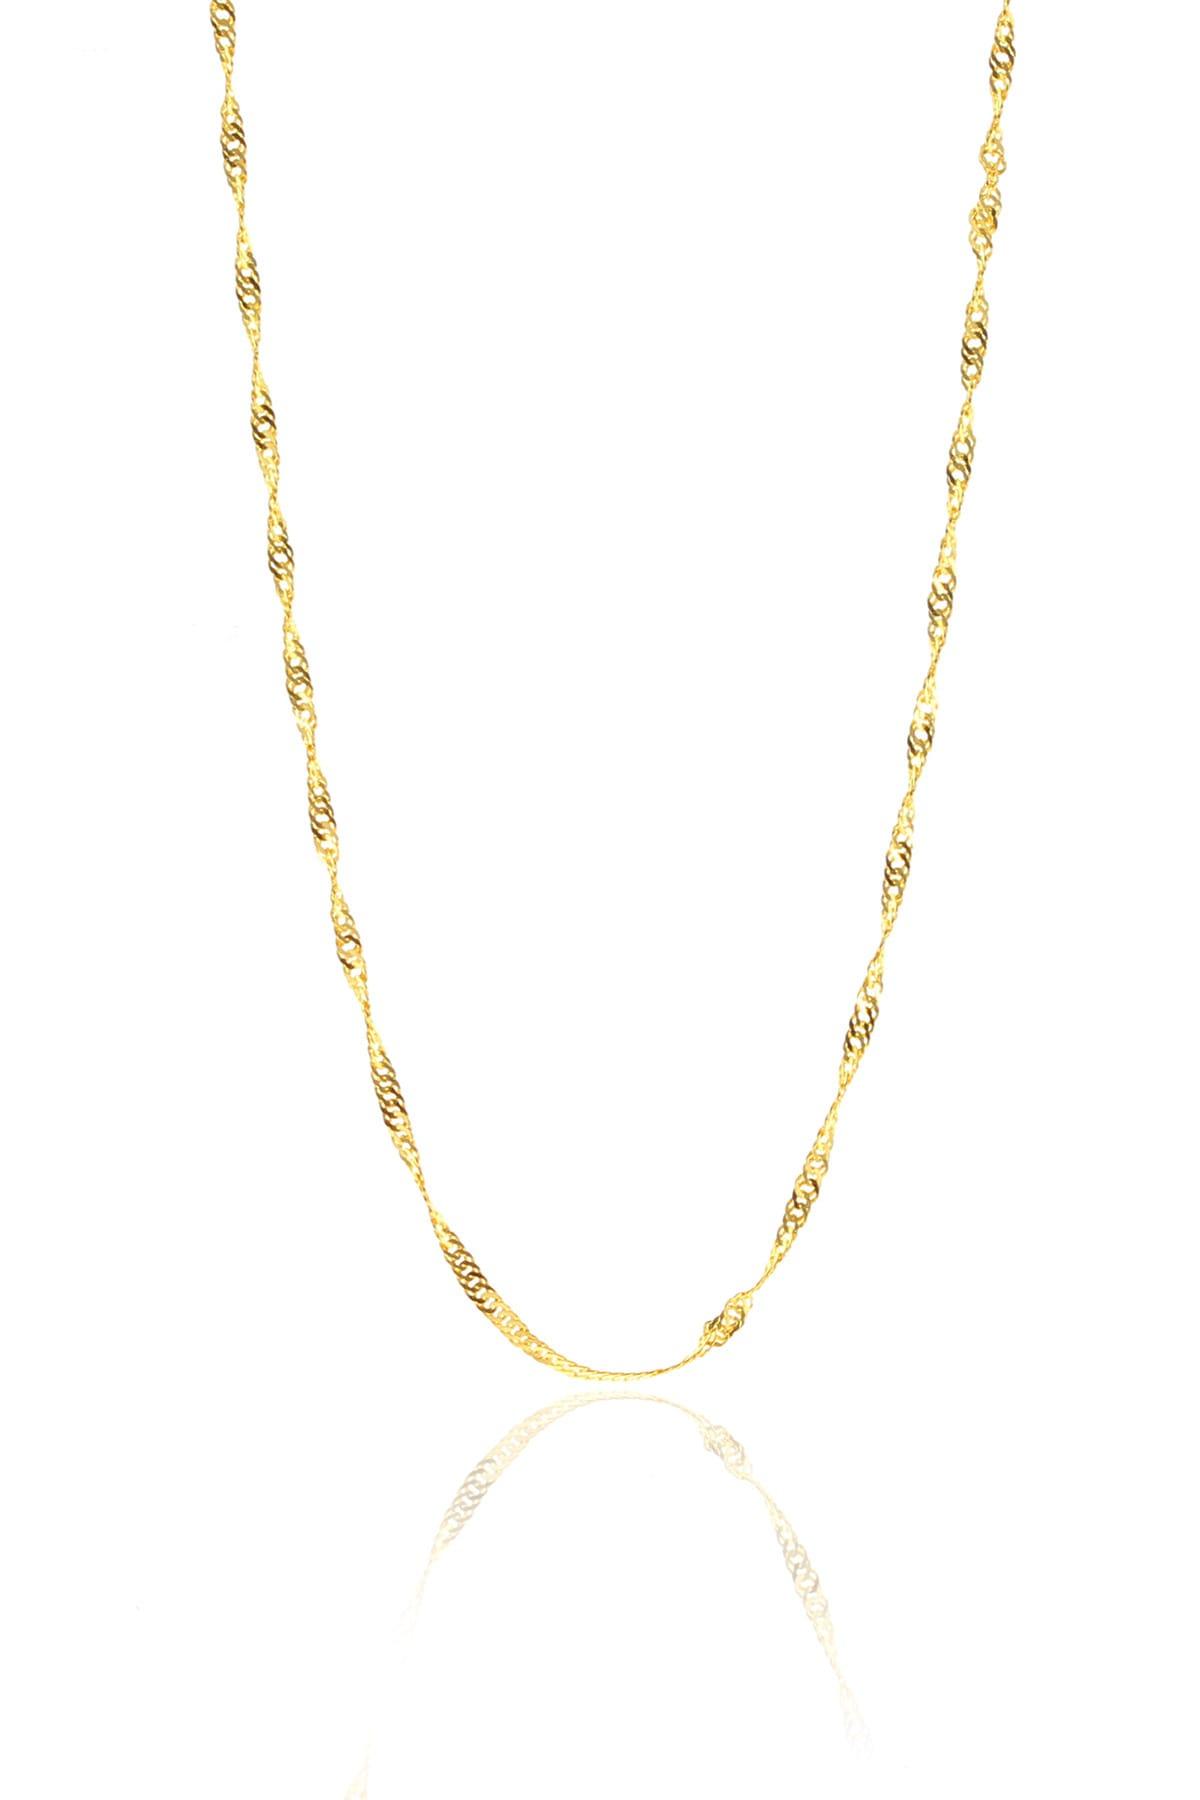 Söğütlü Silver Kadın Gümüş Altın Renkli Singapur Modeli 45 cm Zincir SGTL8933 1